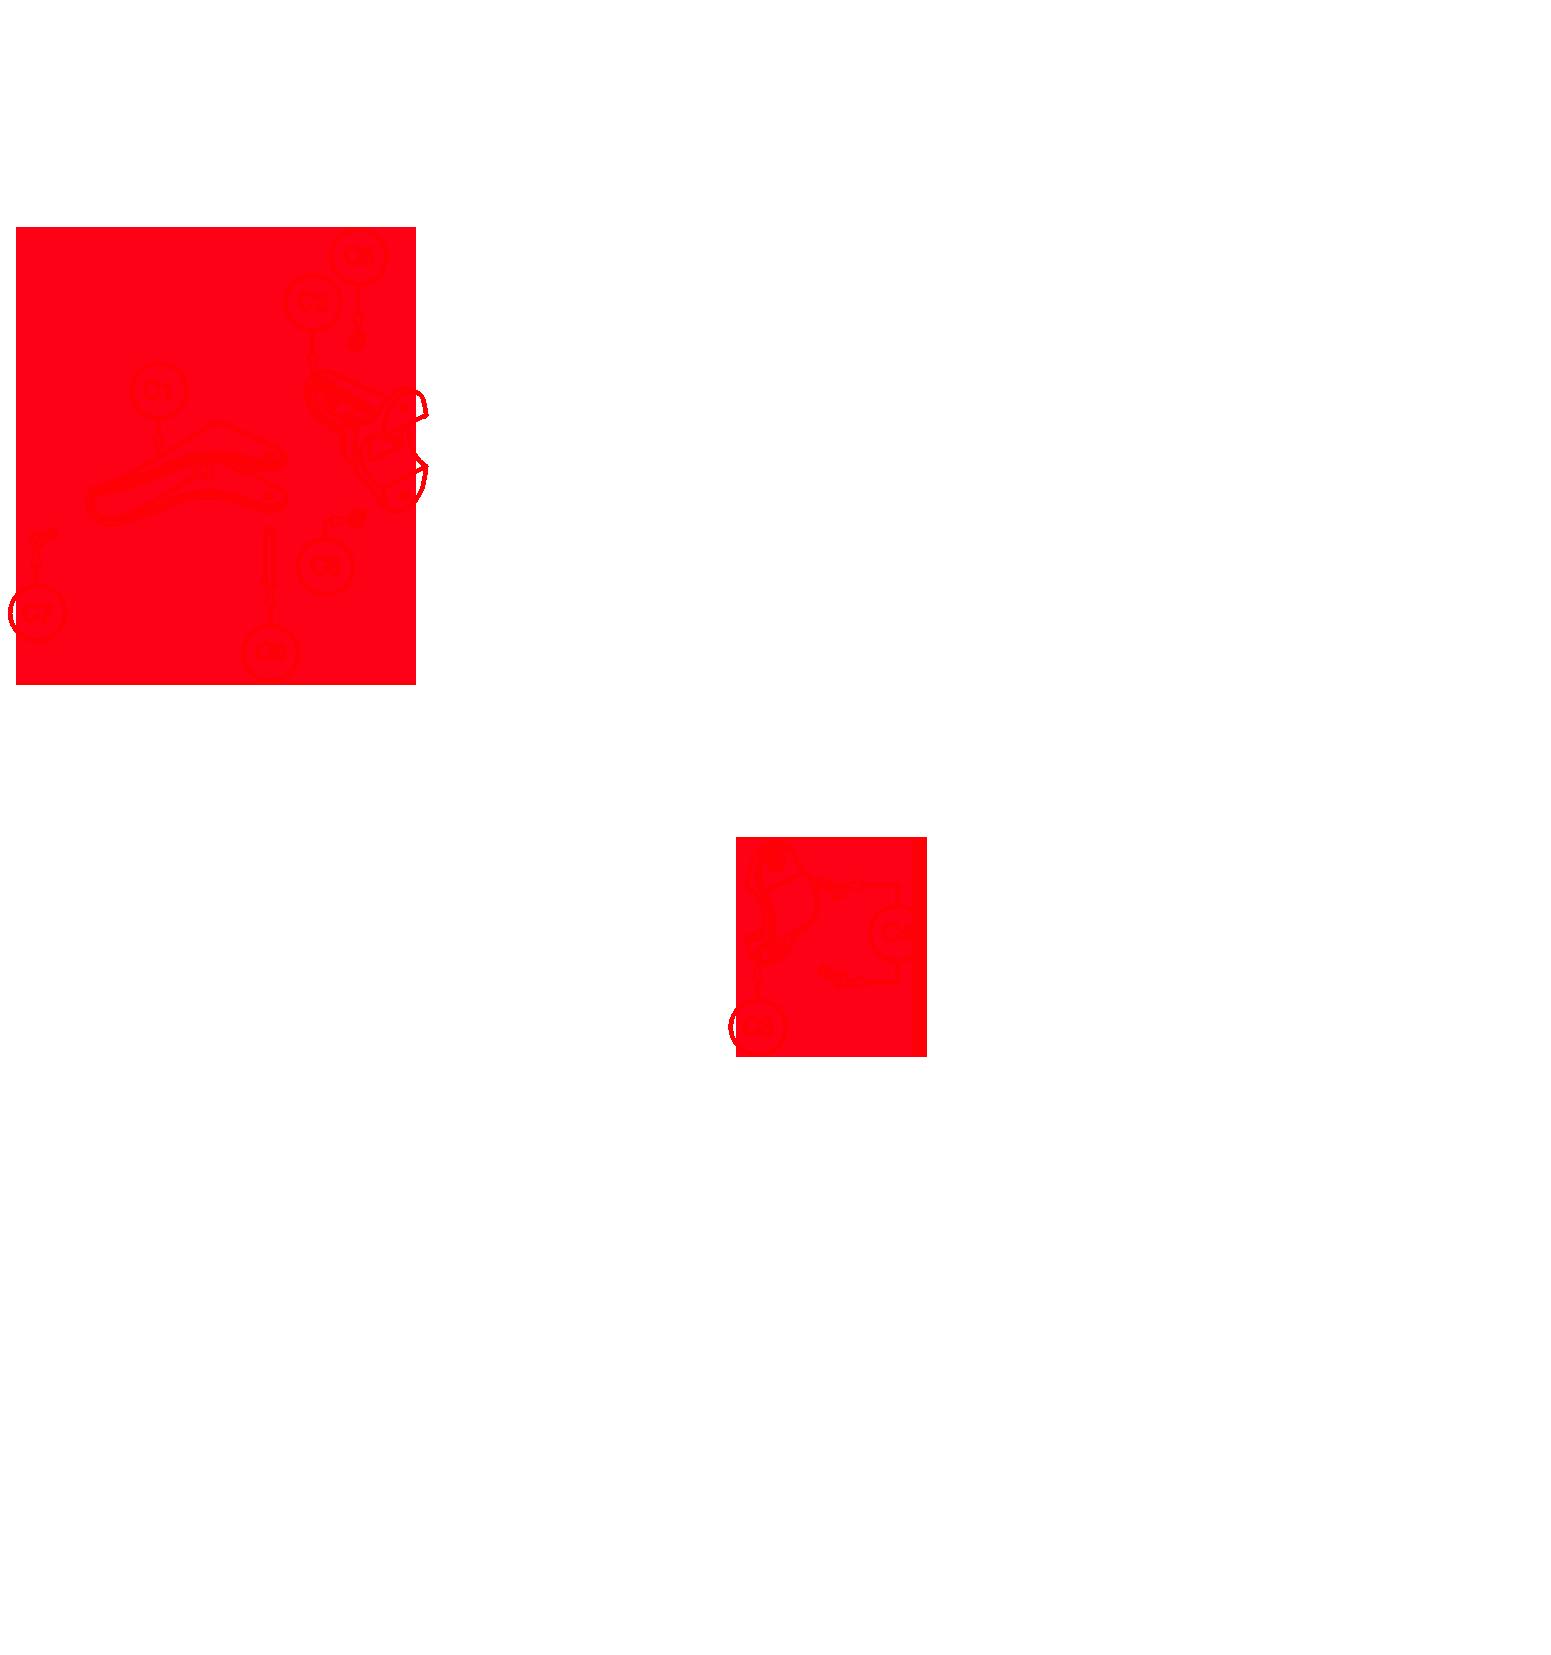 Verstellmechanismus